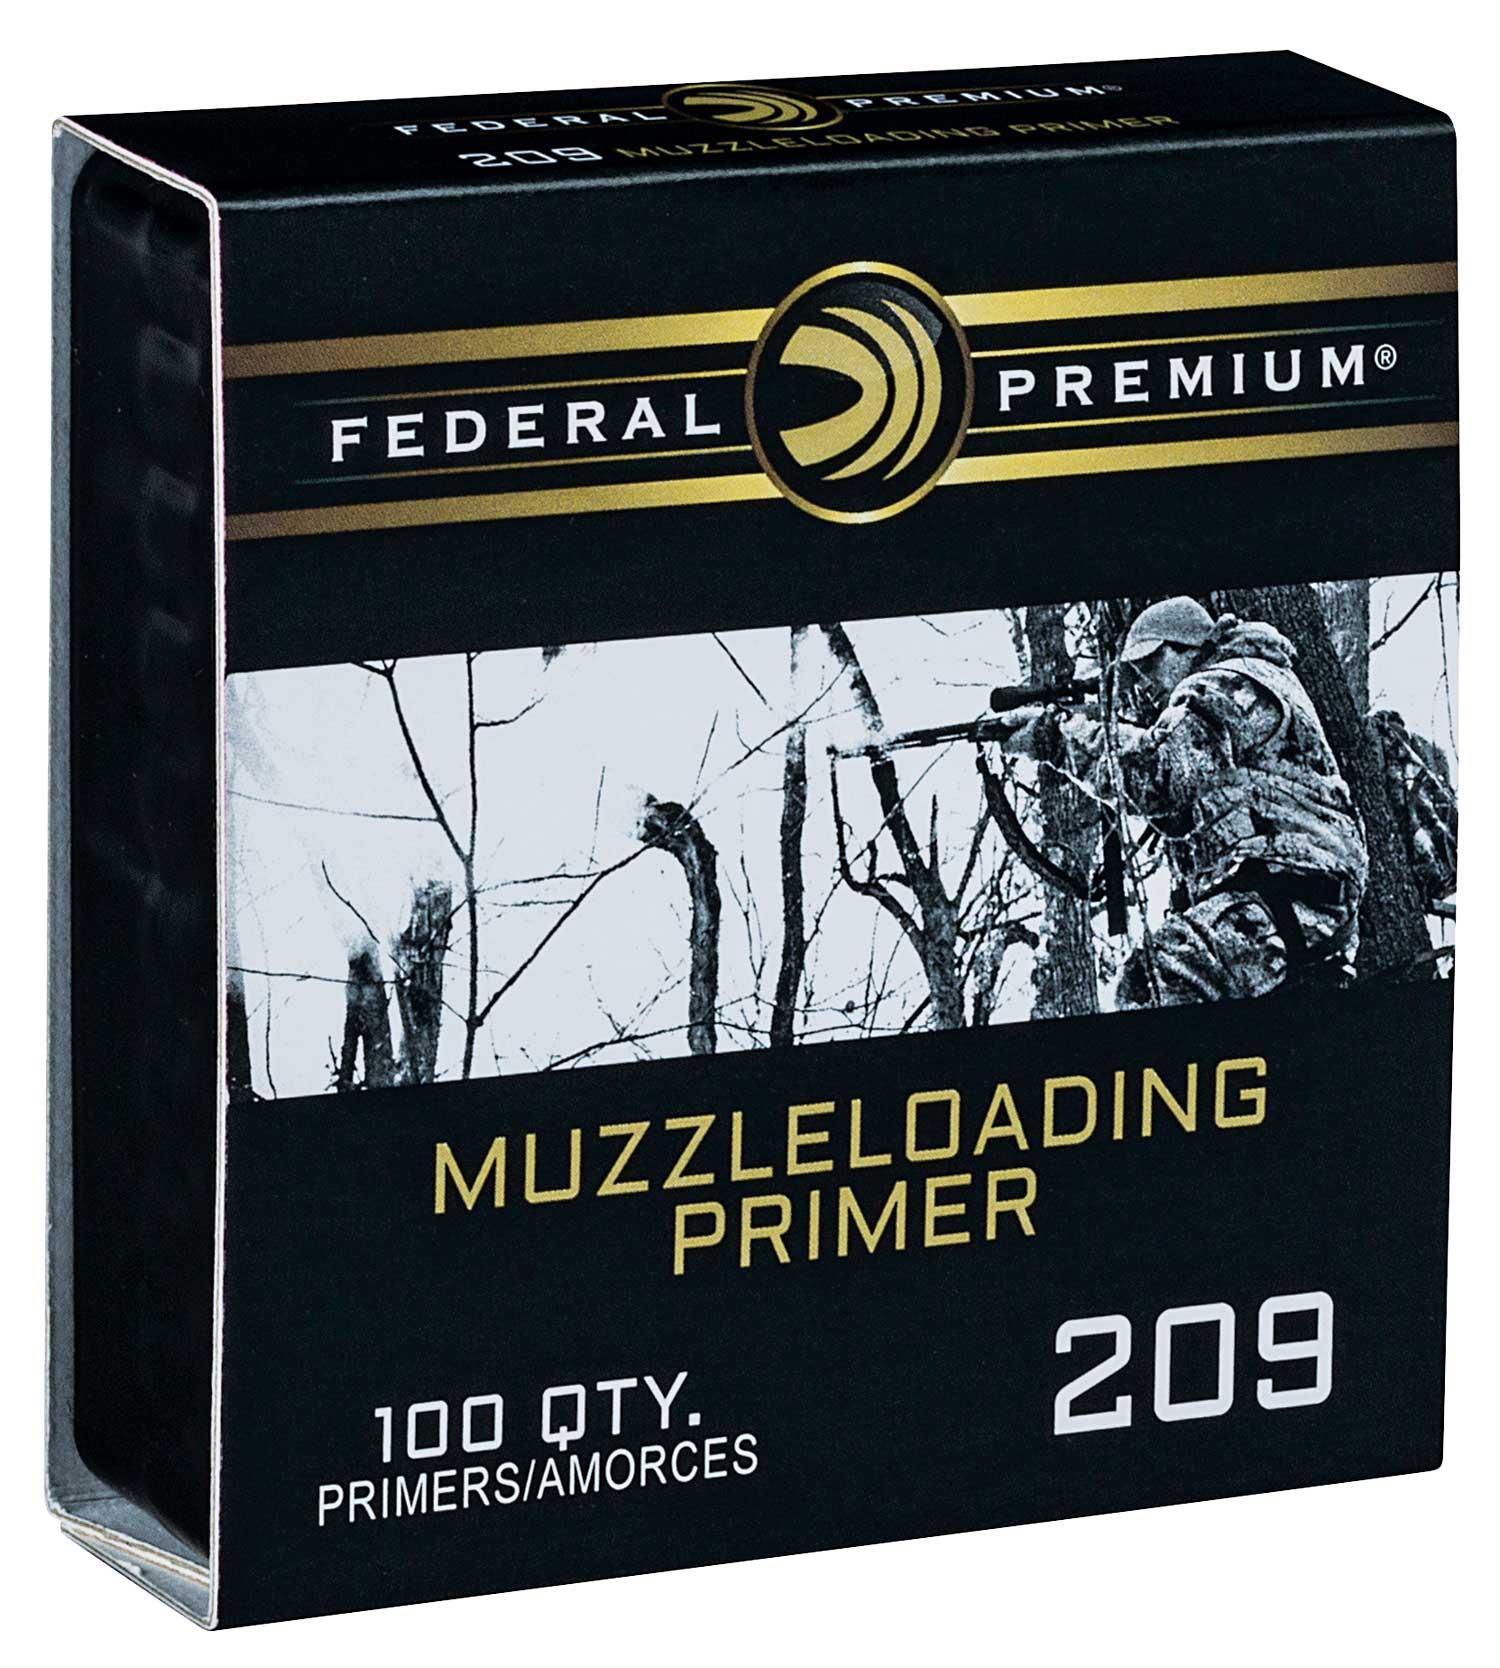 Federal Premium 209 Muzzleloading Primers